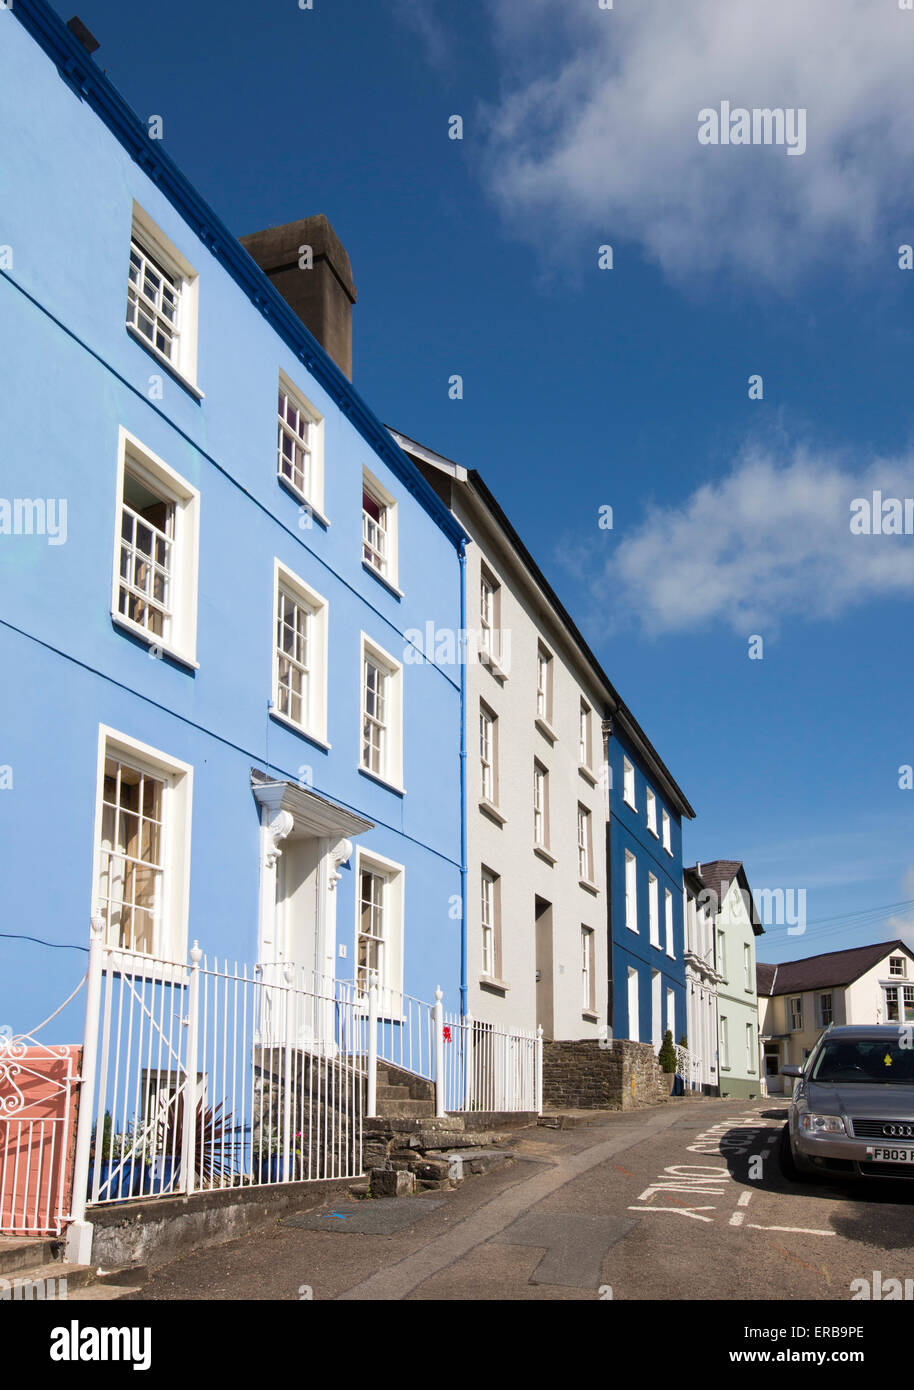 Wales, Carmarthenshire, Llandeilo, Bank Street three storey houses next to former Bank of Black Ox - Stock Image